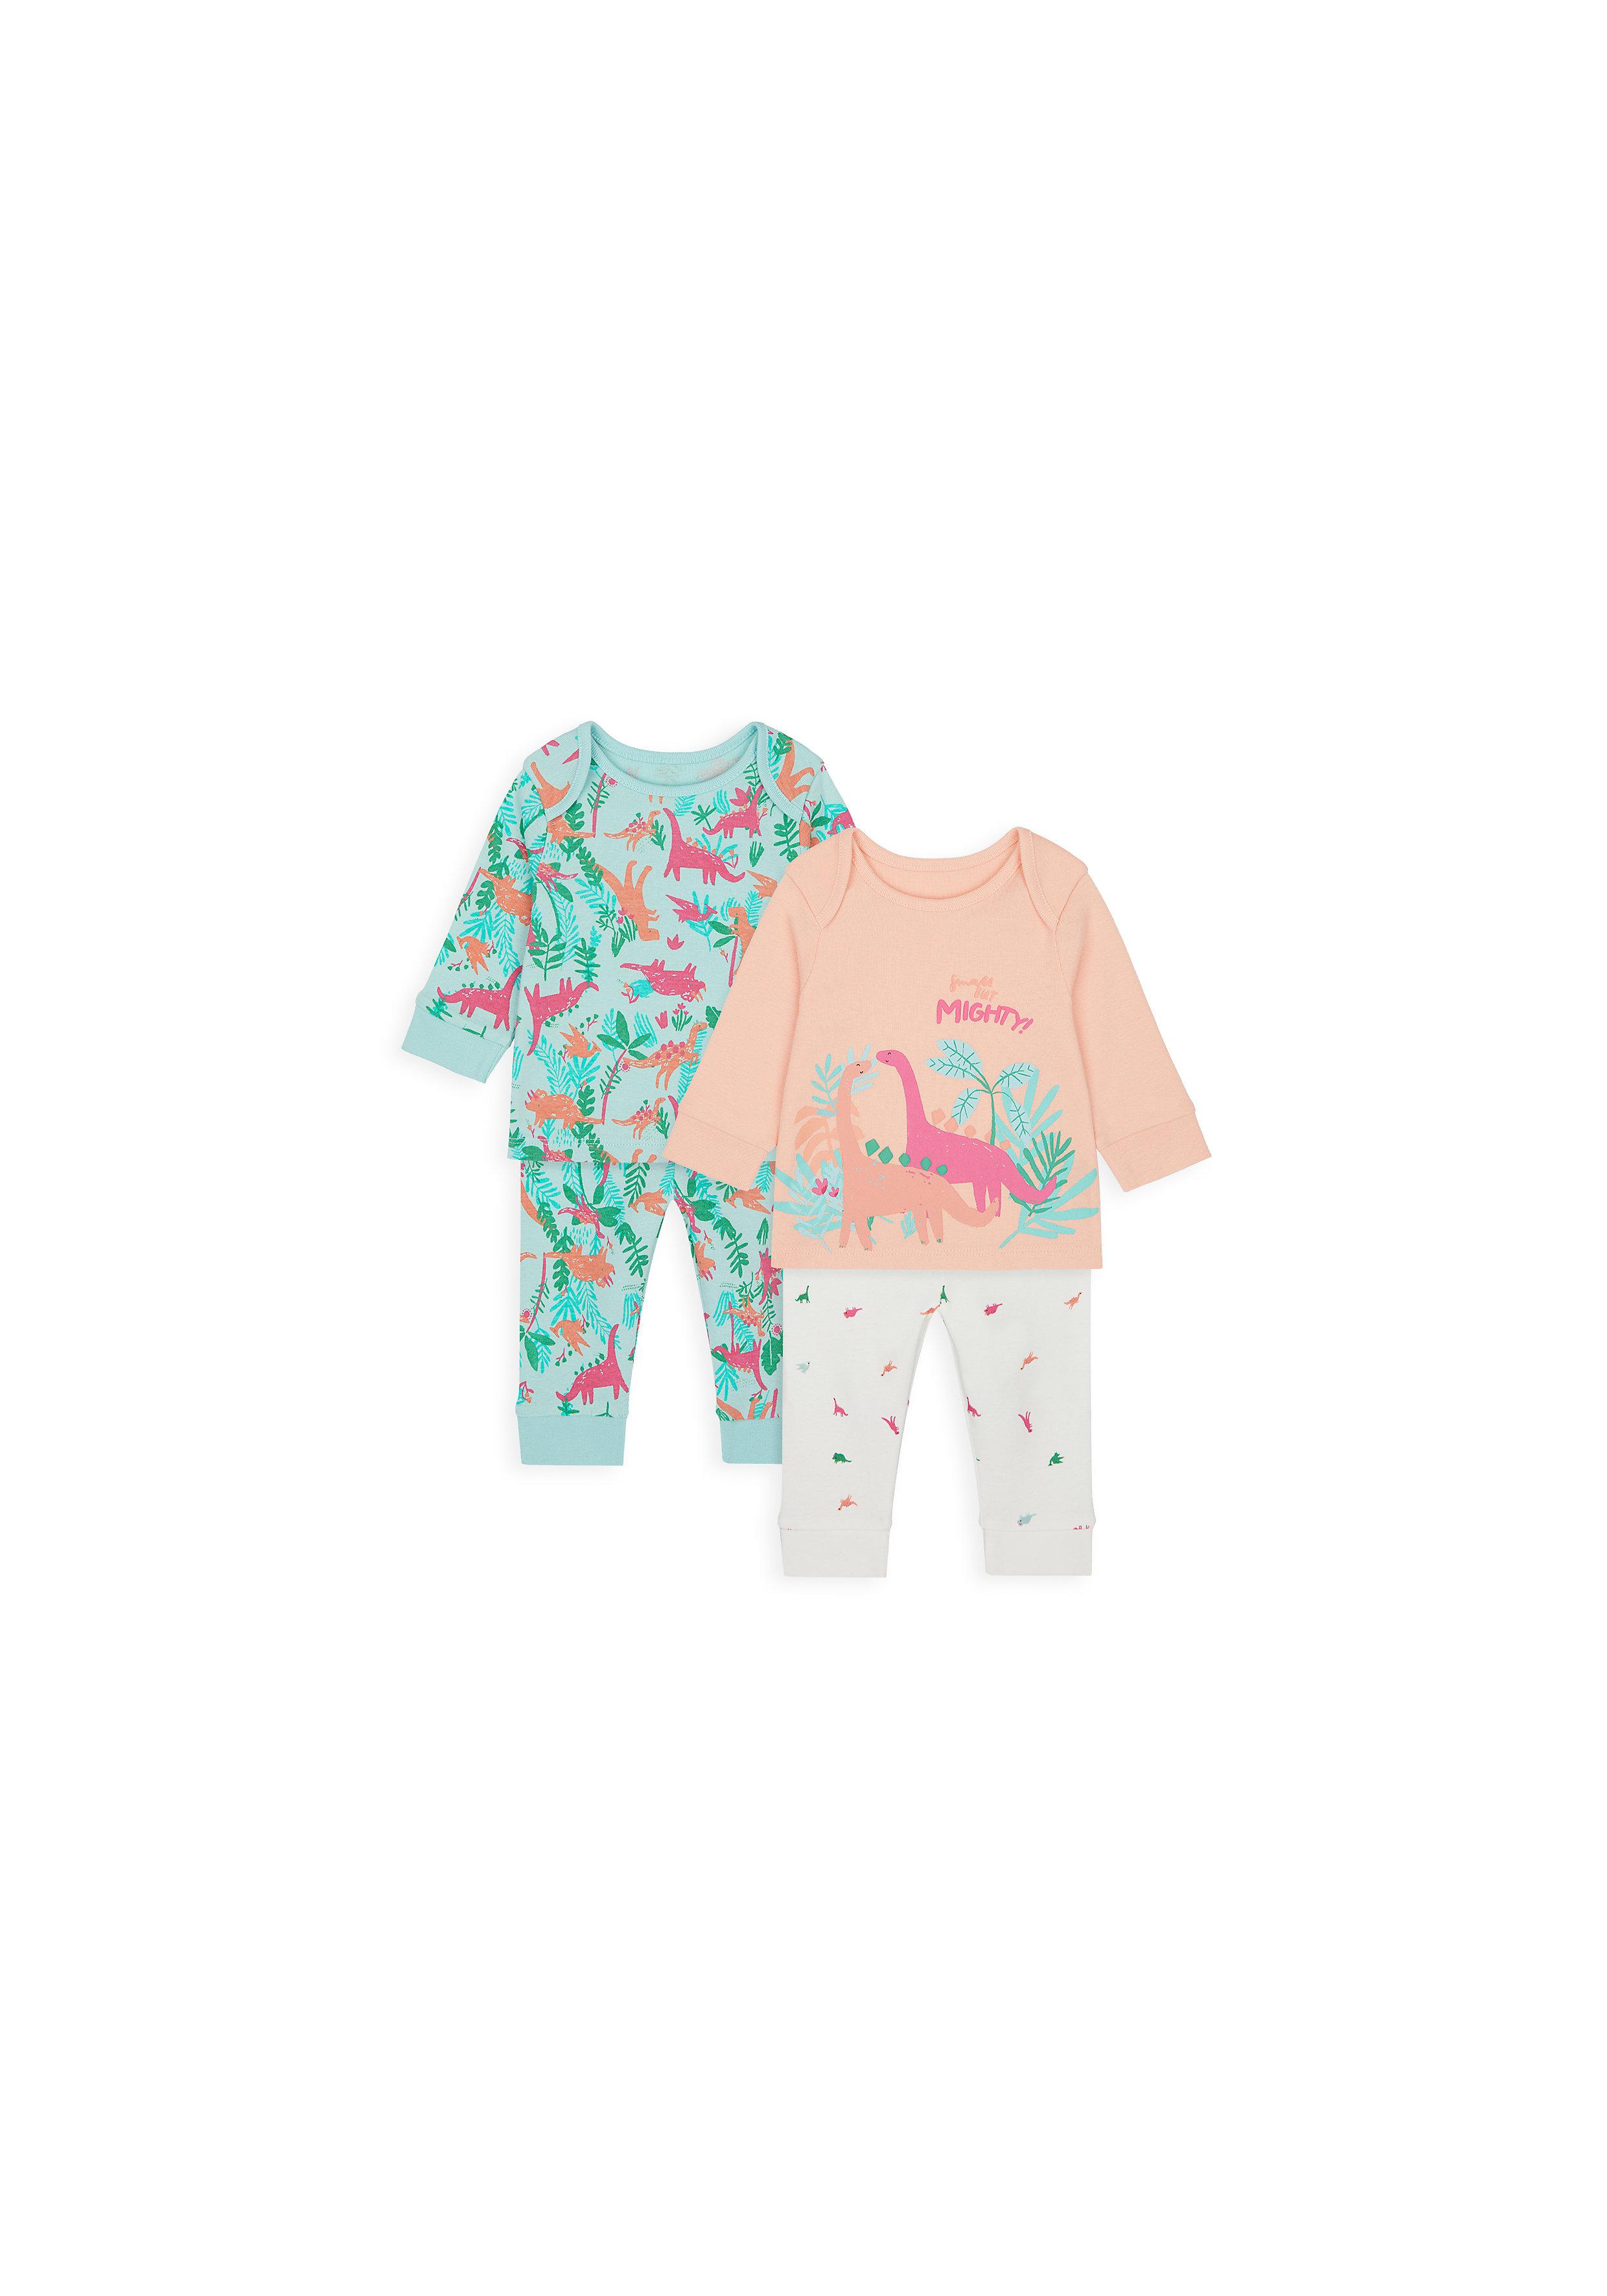 Mothercare | Girls Full Sleeves Pyjama Set Dino Print - Pack Of 2 - Multicolor